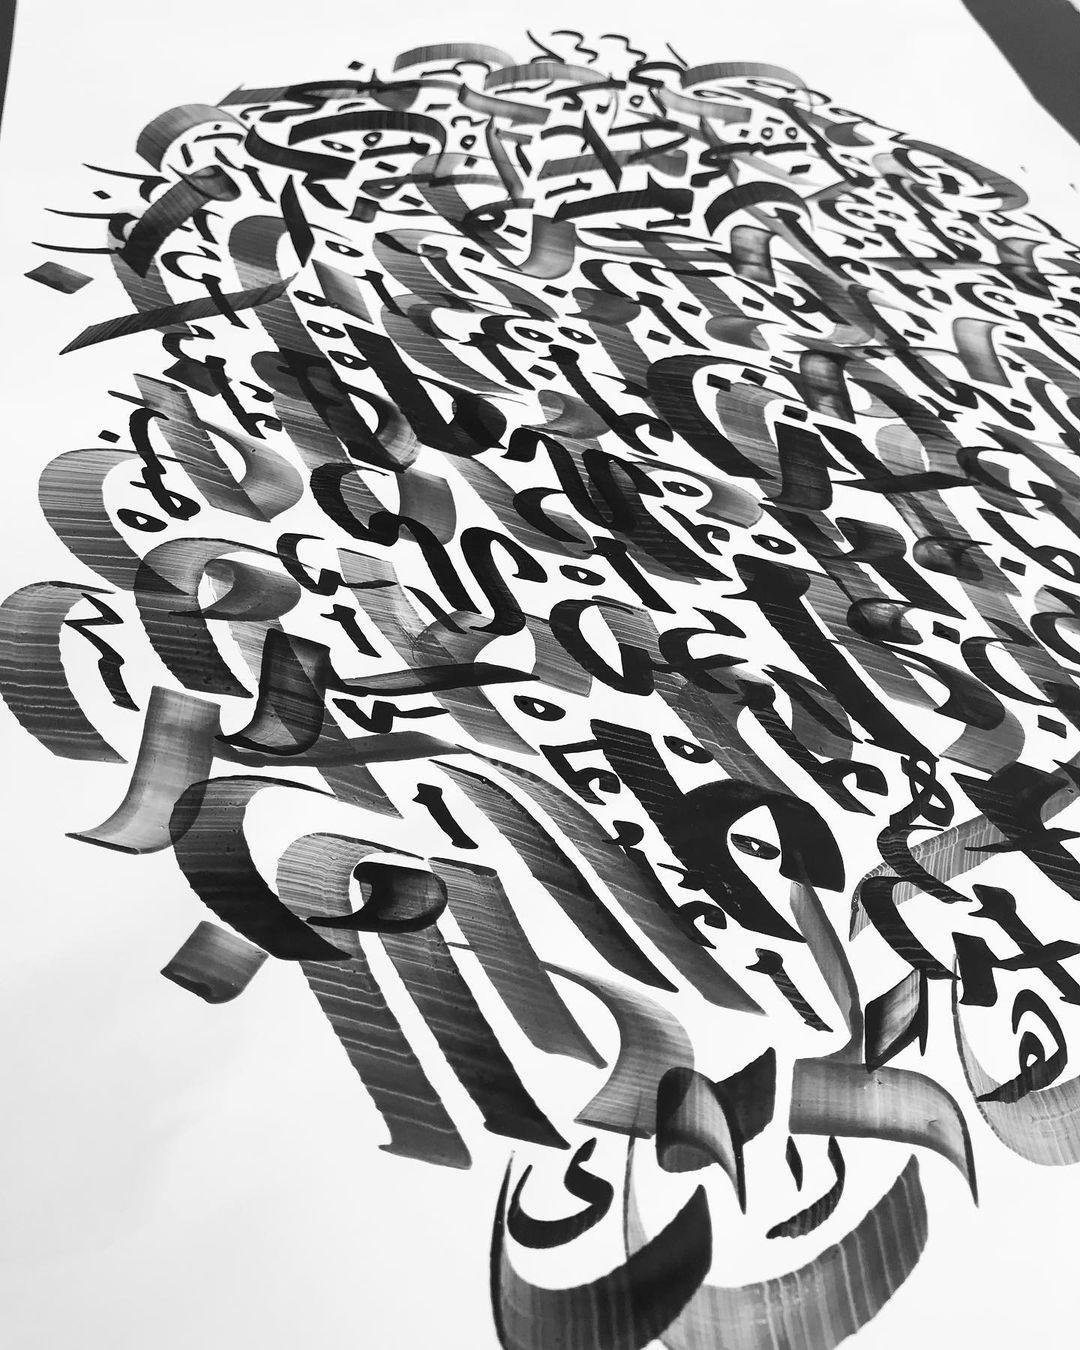 Donwload Photo #exercise #arabiccalligraphy #islamiccalligraphy #tezhip #hüsnühat #hüsnihat ...- hattat_aa 4